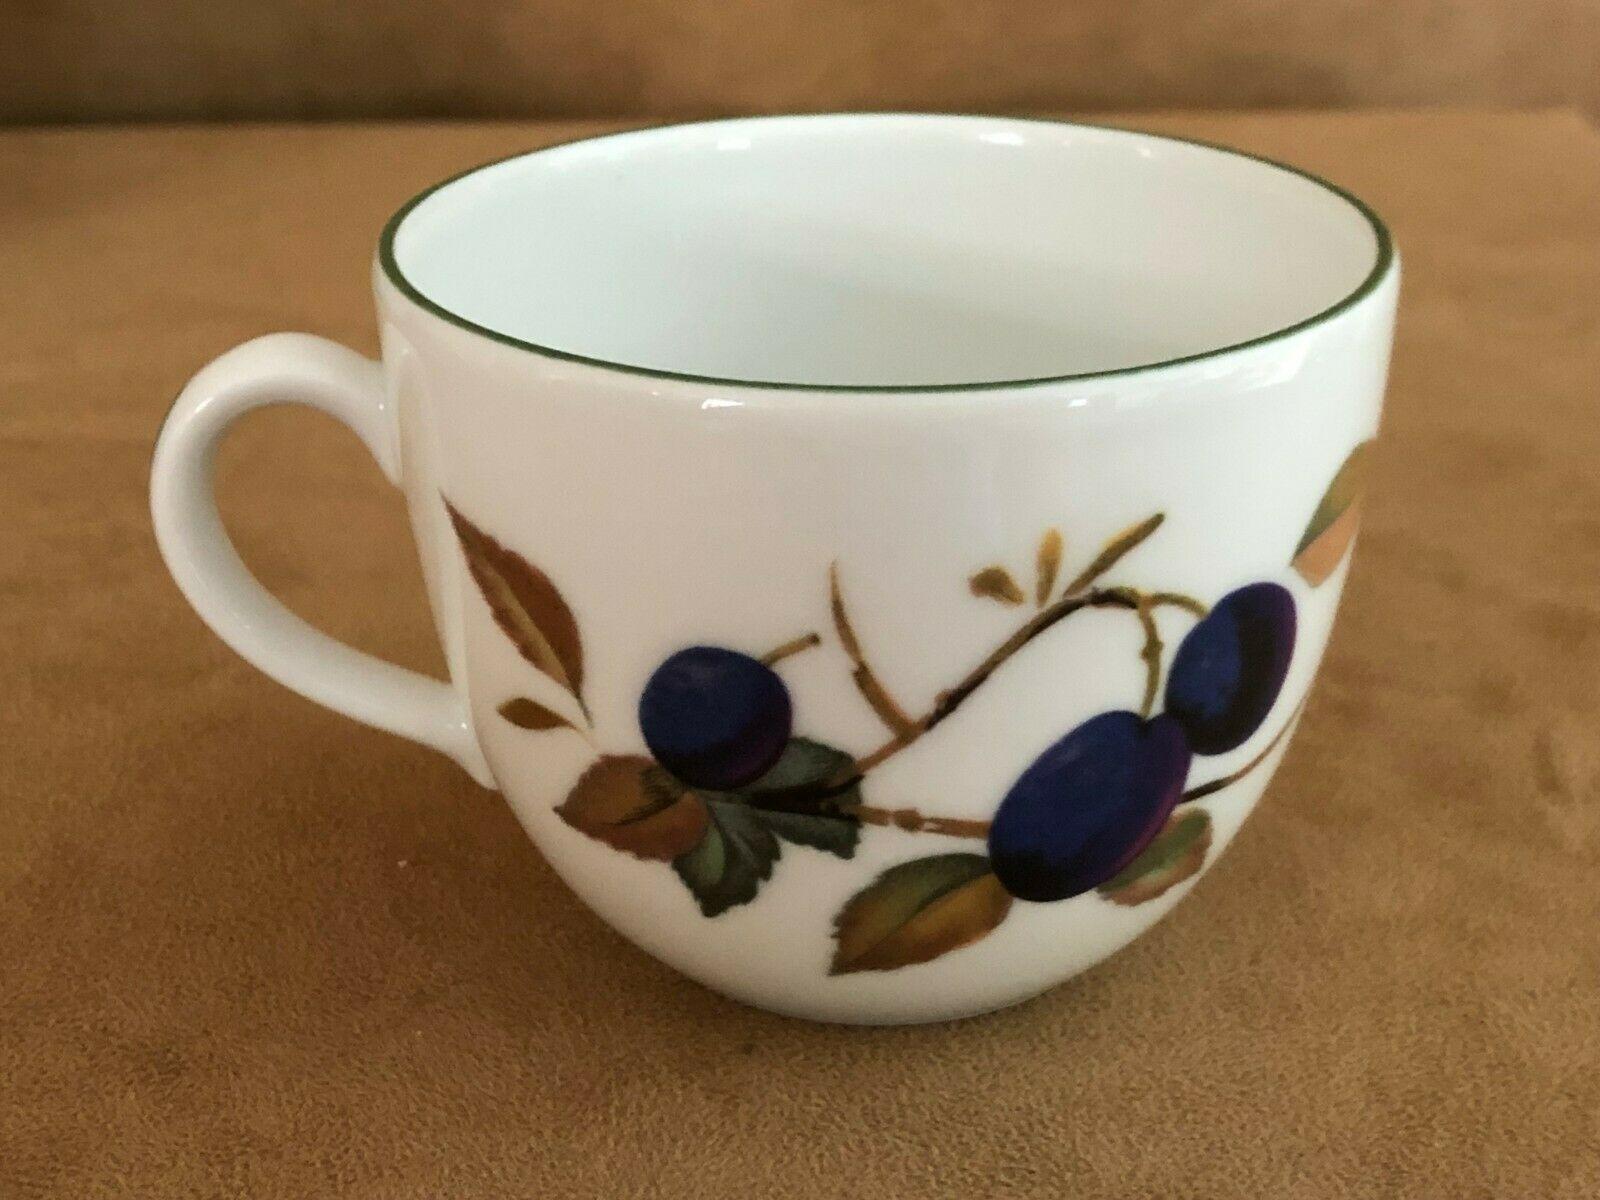 Set of 6 Royal Worcester Evesham gold fruit Cup and saucer lot coffee mug dish